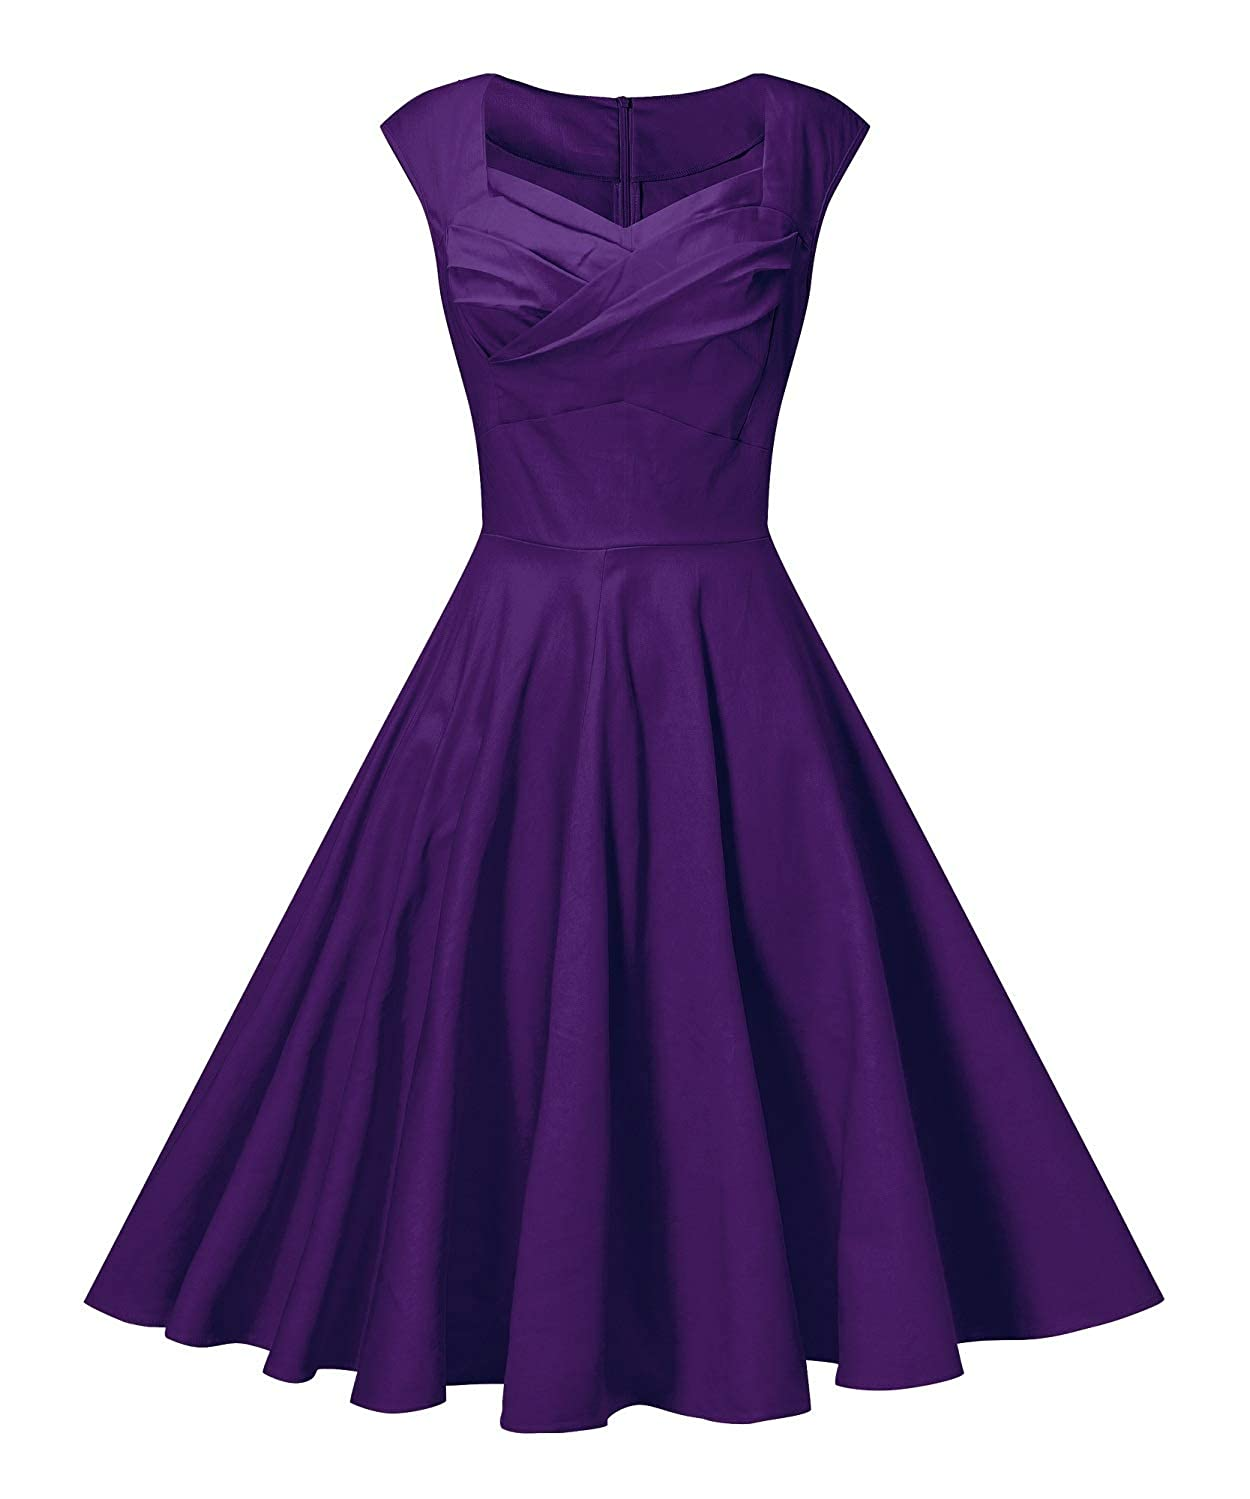 Purple PENGEE Women's Retro 1950s Vintage Party Swing Dress Cap Sleeve Cocktail Dress